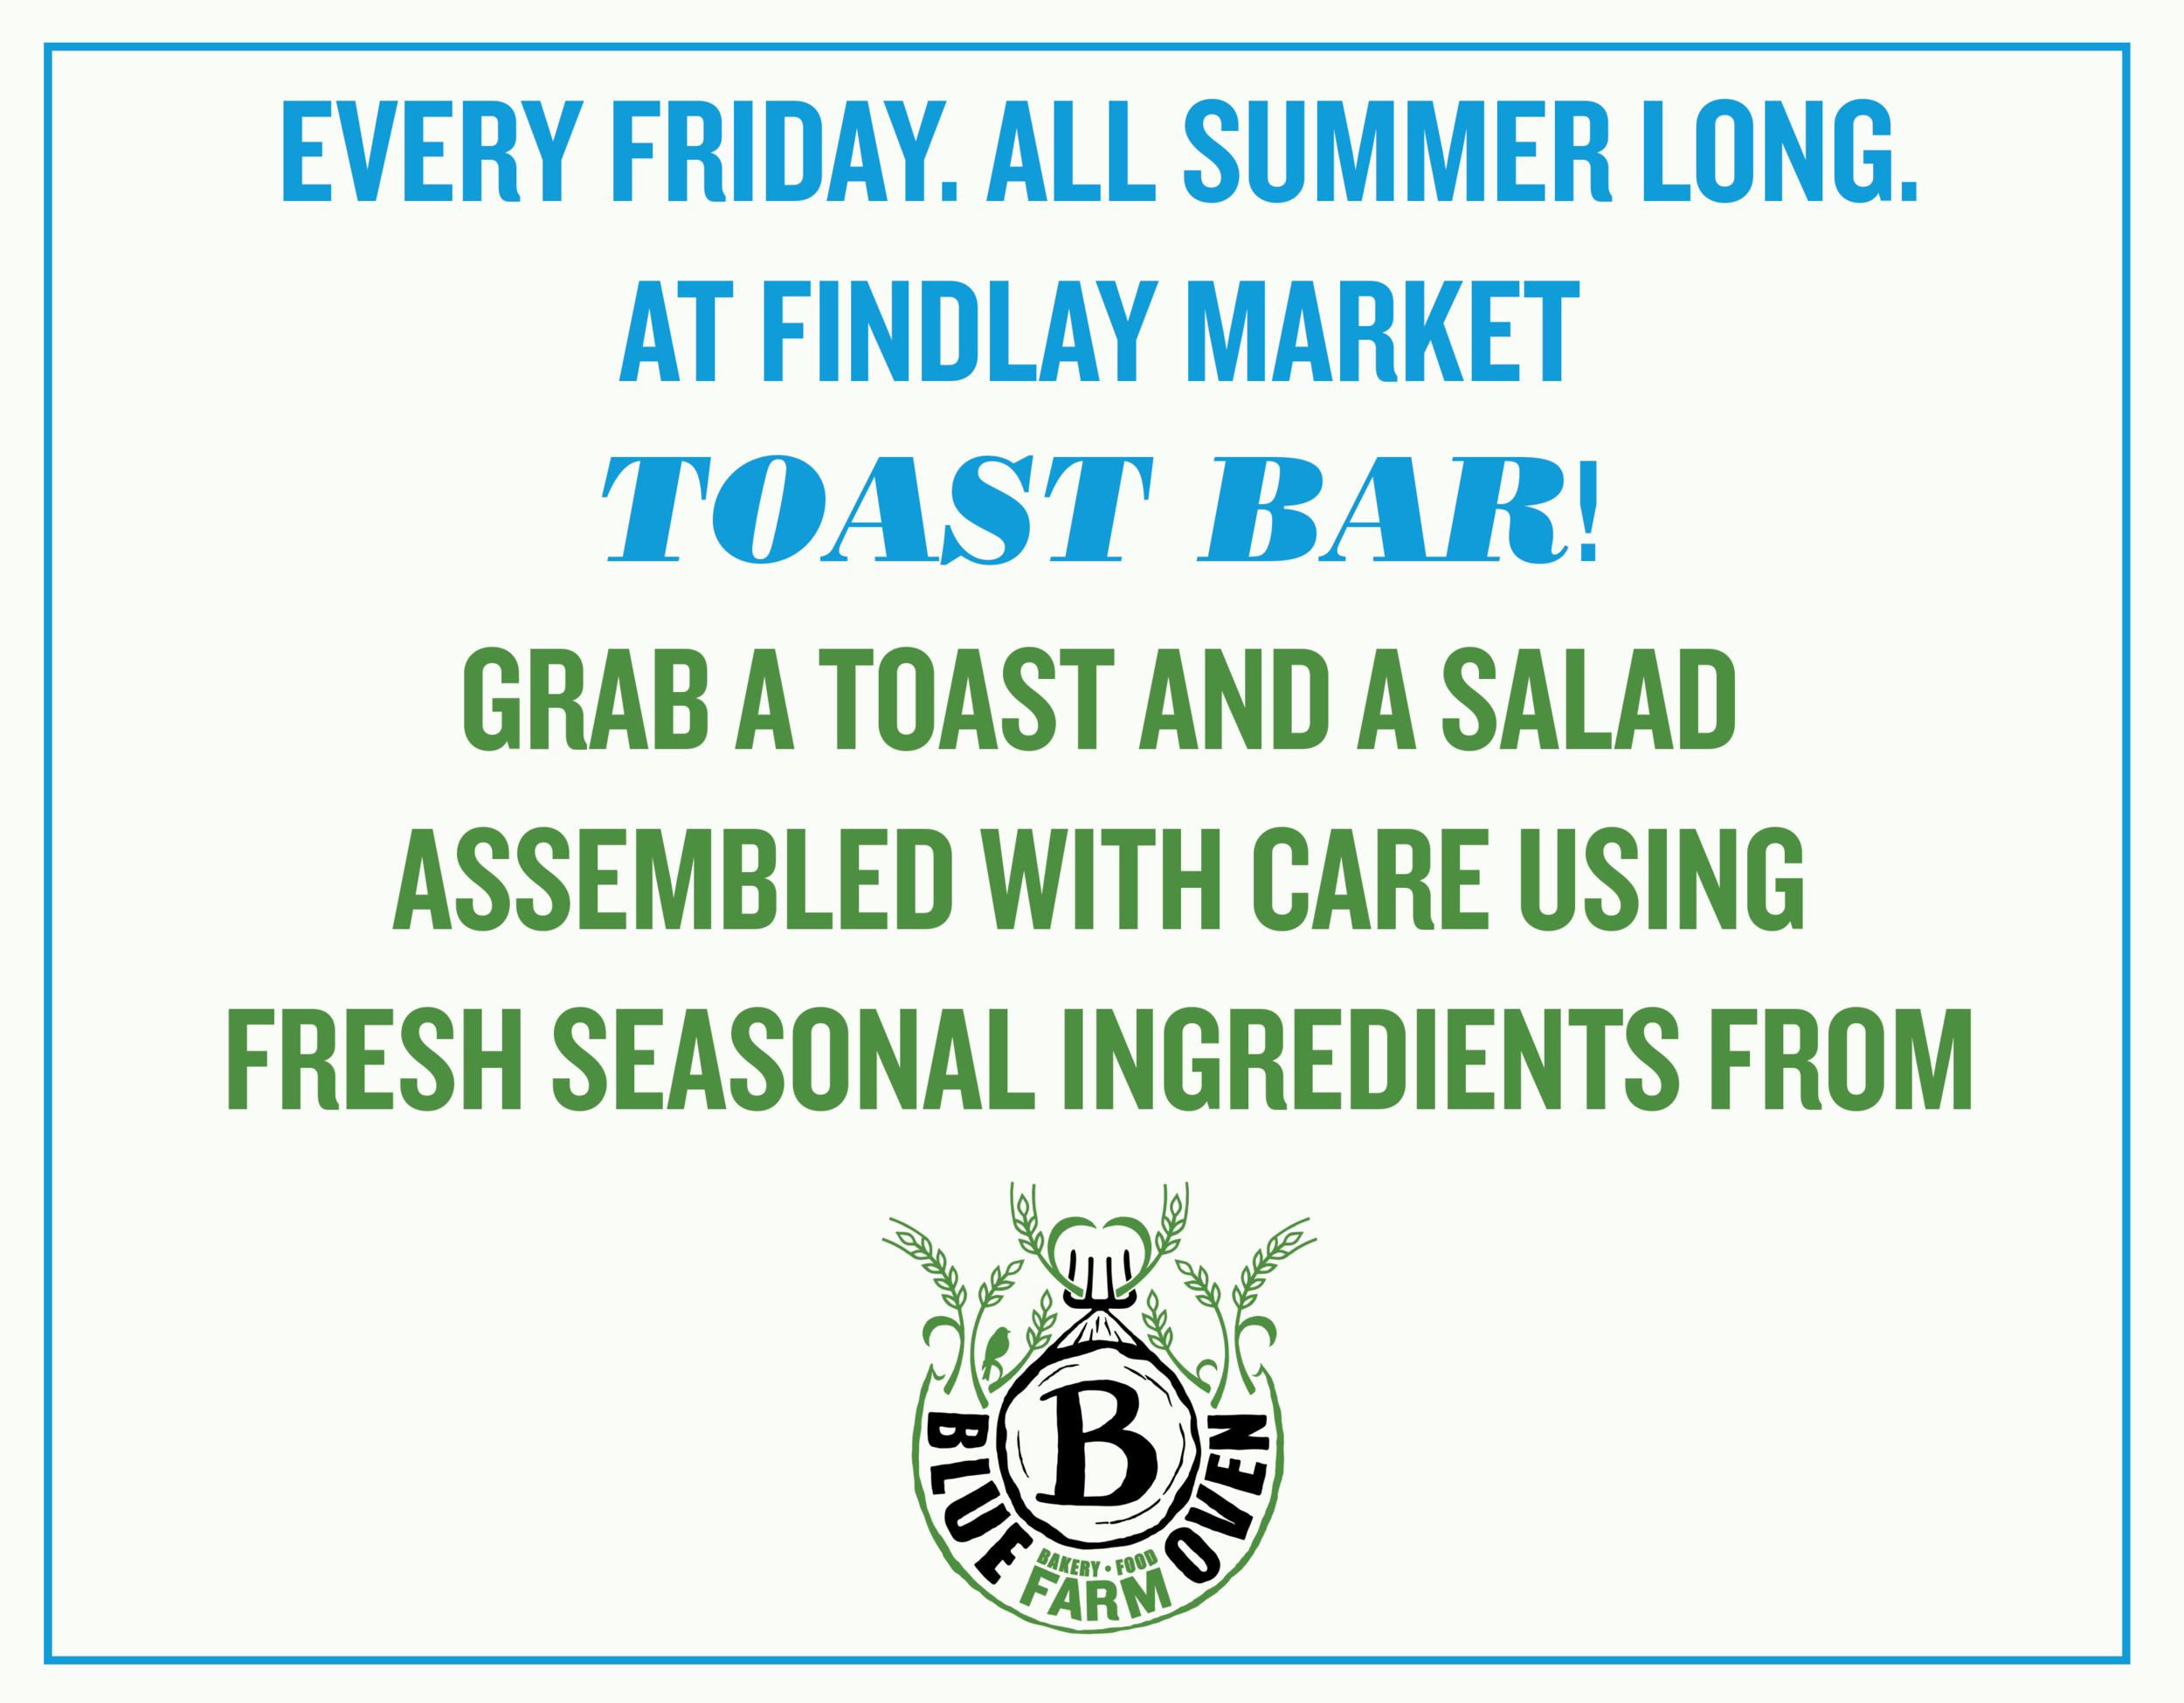 Blue Oven Farm Salad Bar Flyer.png